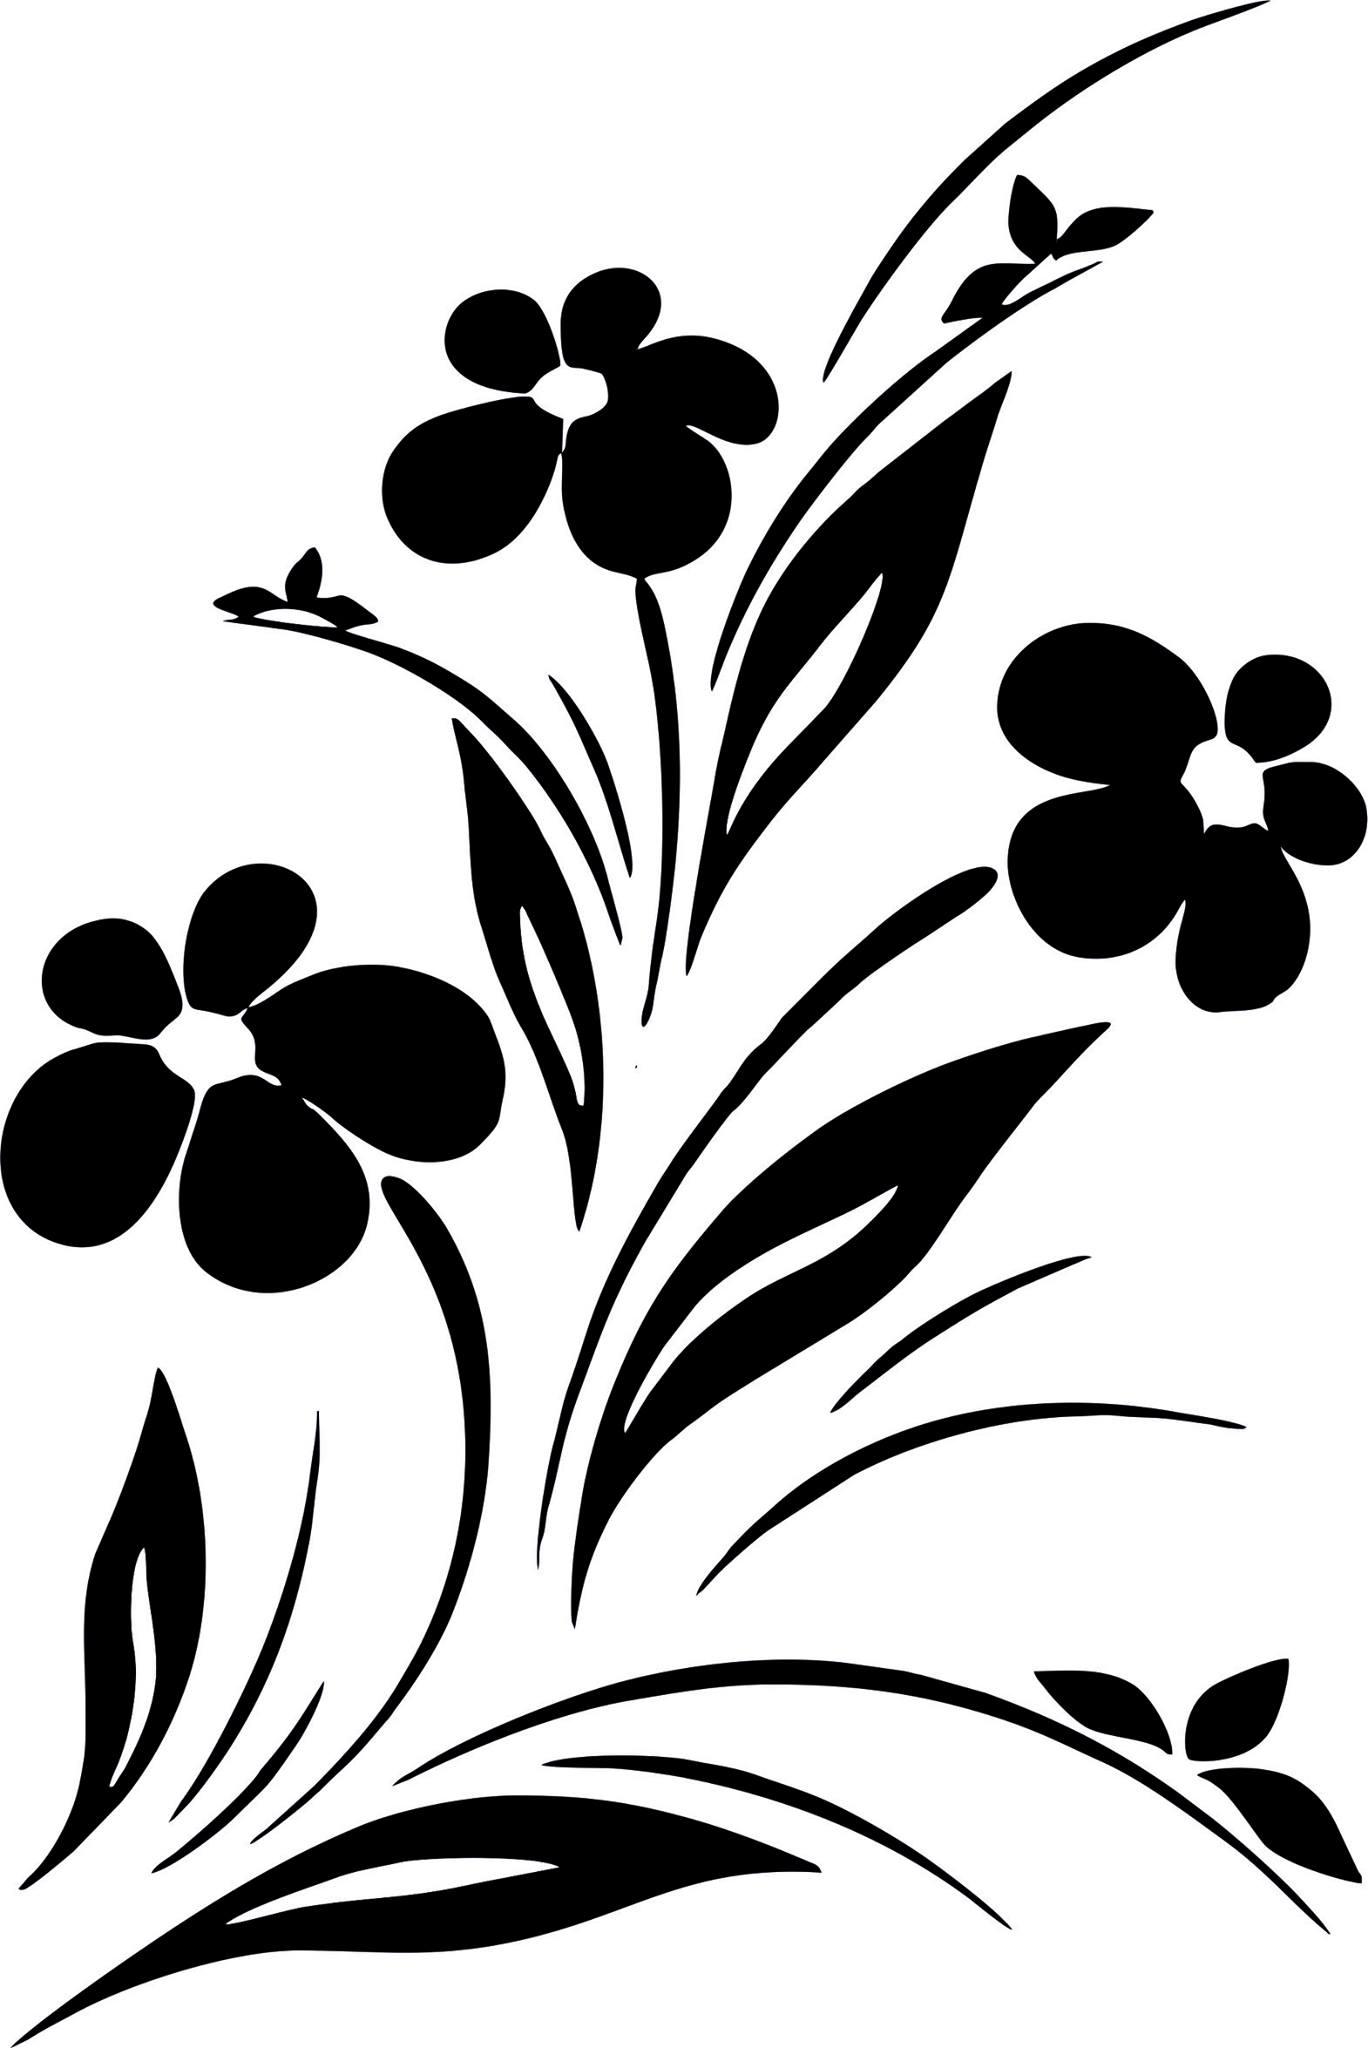 Simple Flower Designs Black And White Vector Art jpg Image